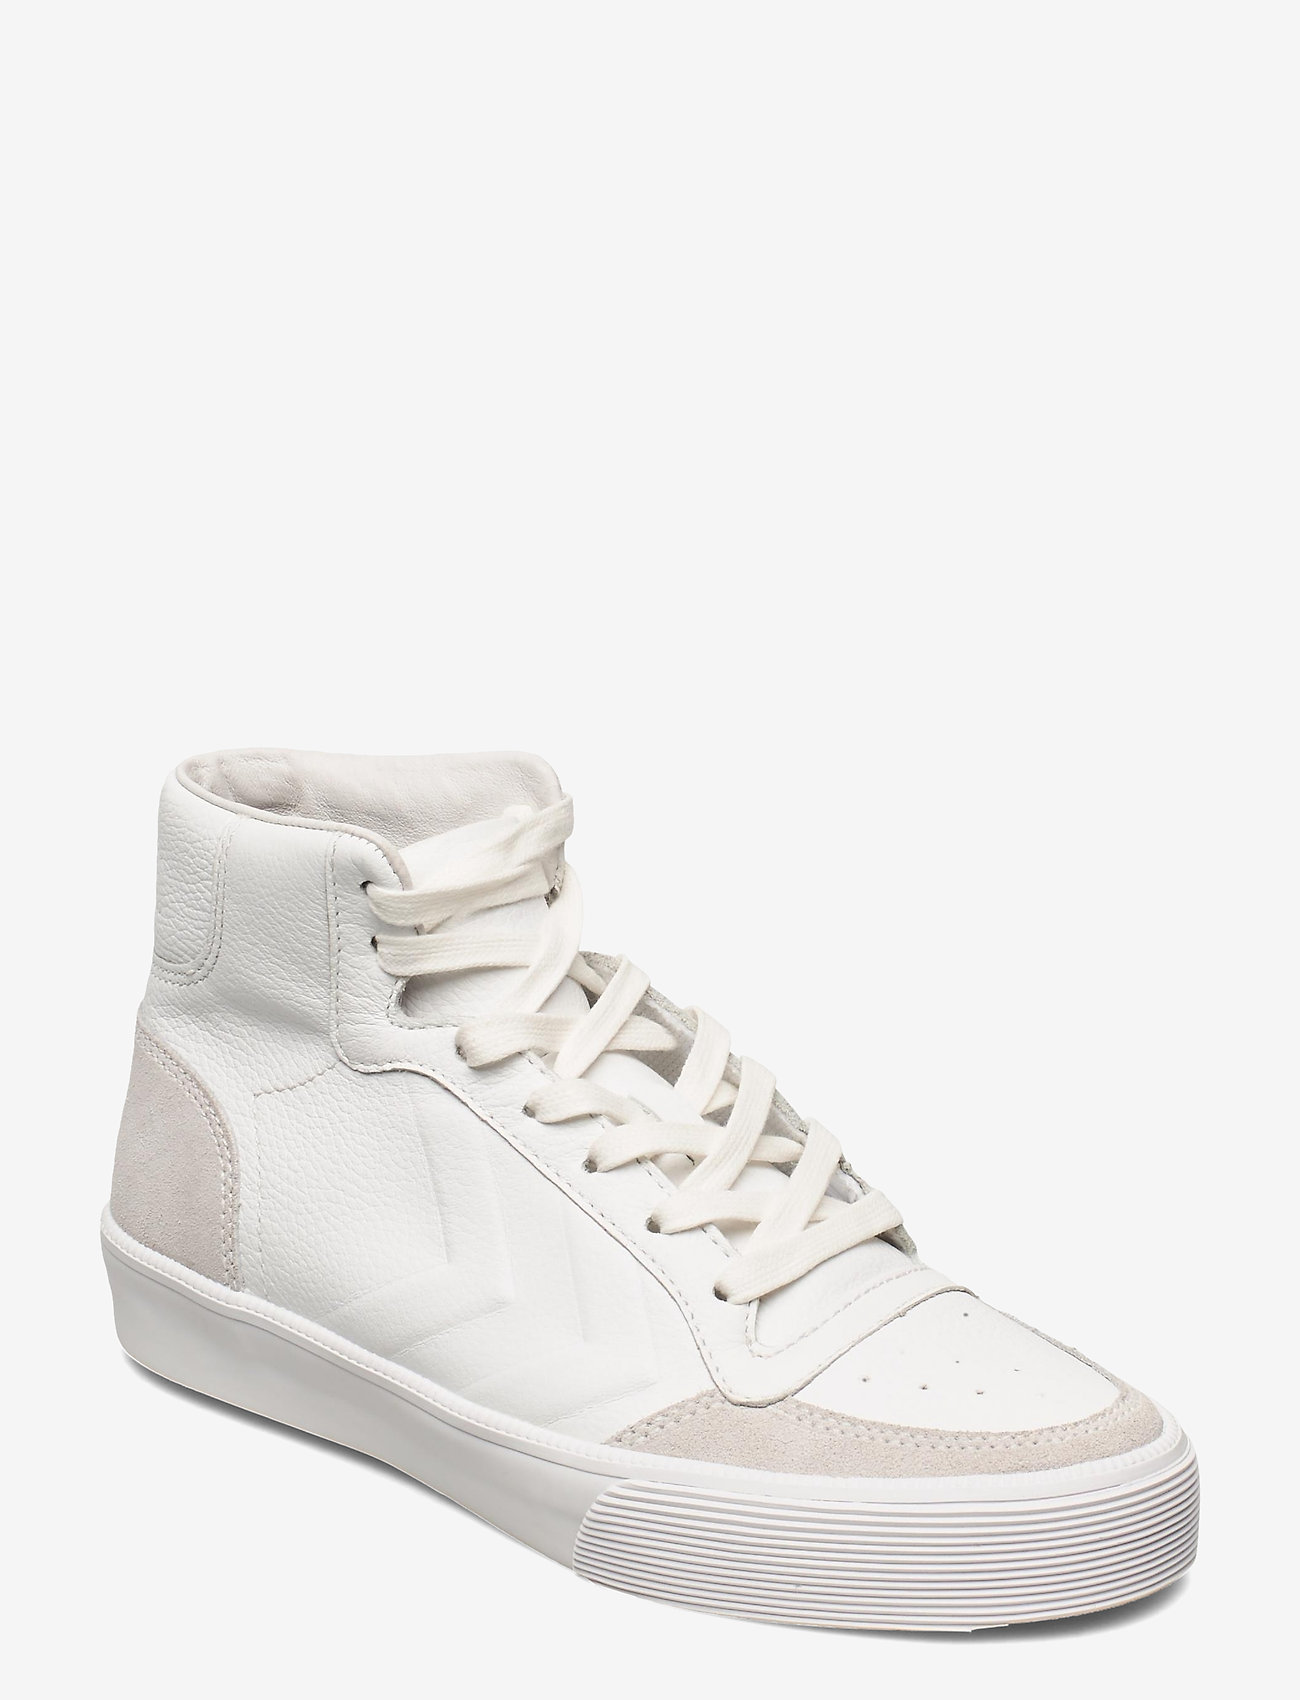 Hummel - STADIL RMX HIGH SNEAKER - hoog sneakers - white - 0